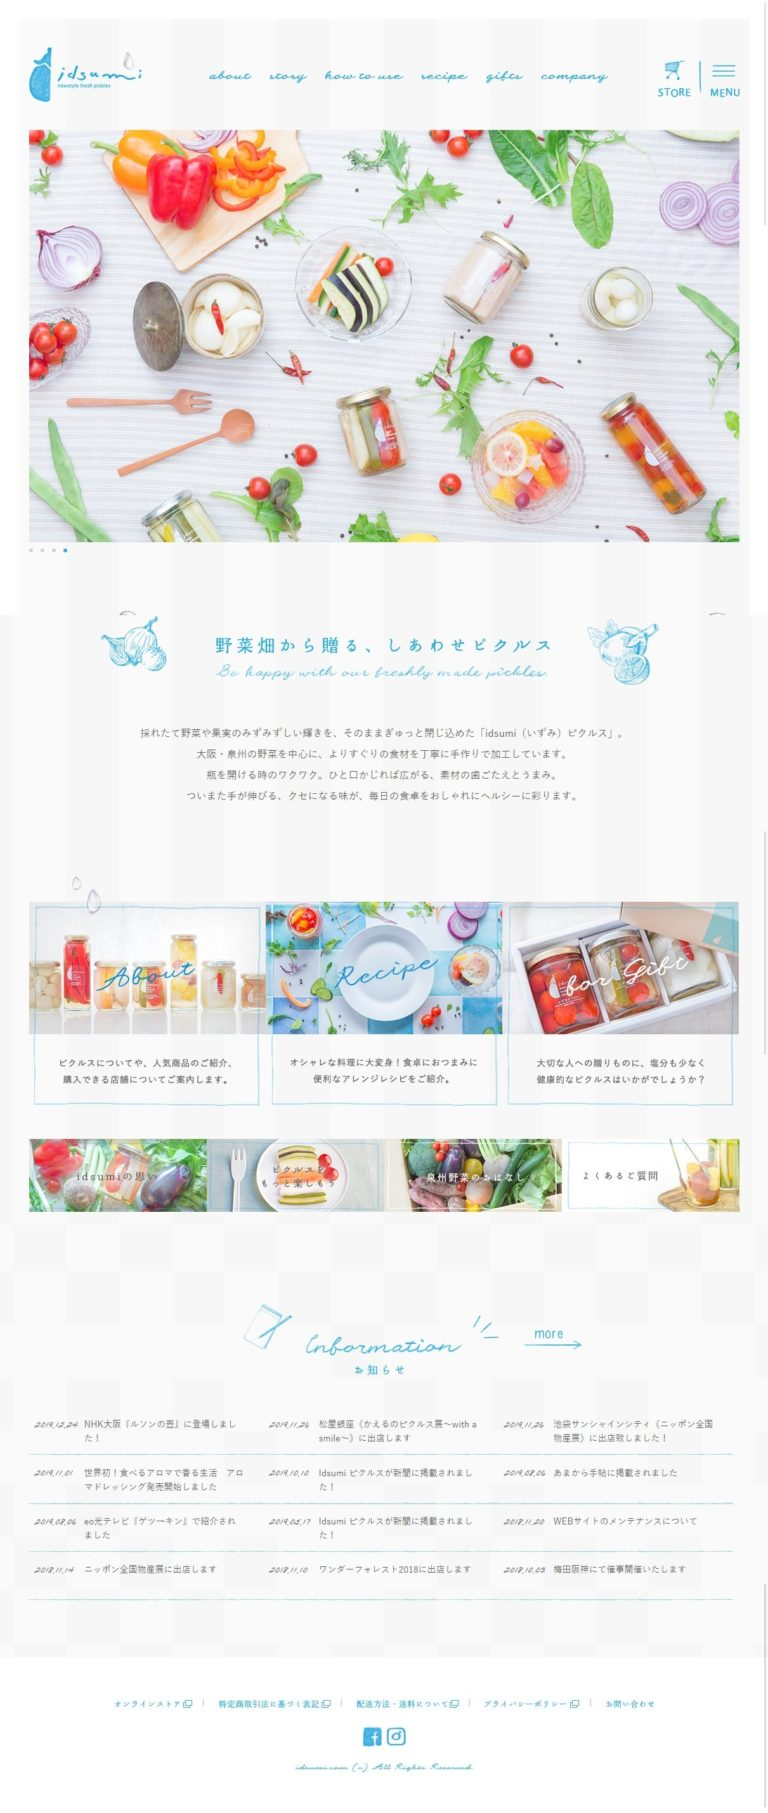 idsumiのピクルス|泉州野菜のピクルス|大阪のお土産